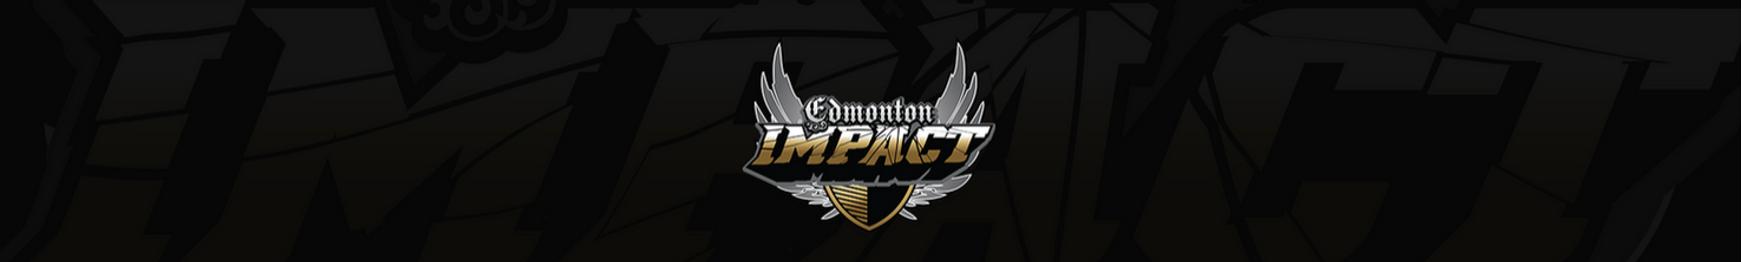 LogoBar_EdmontonImpact.png